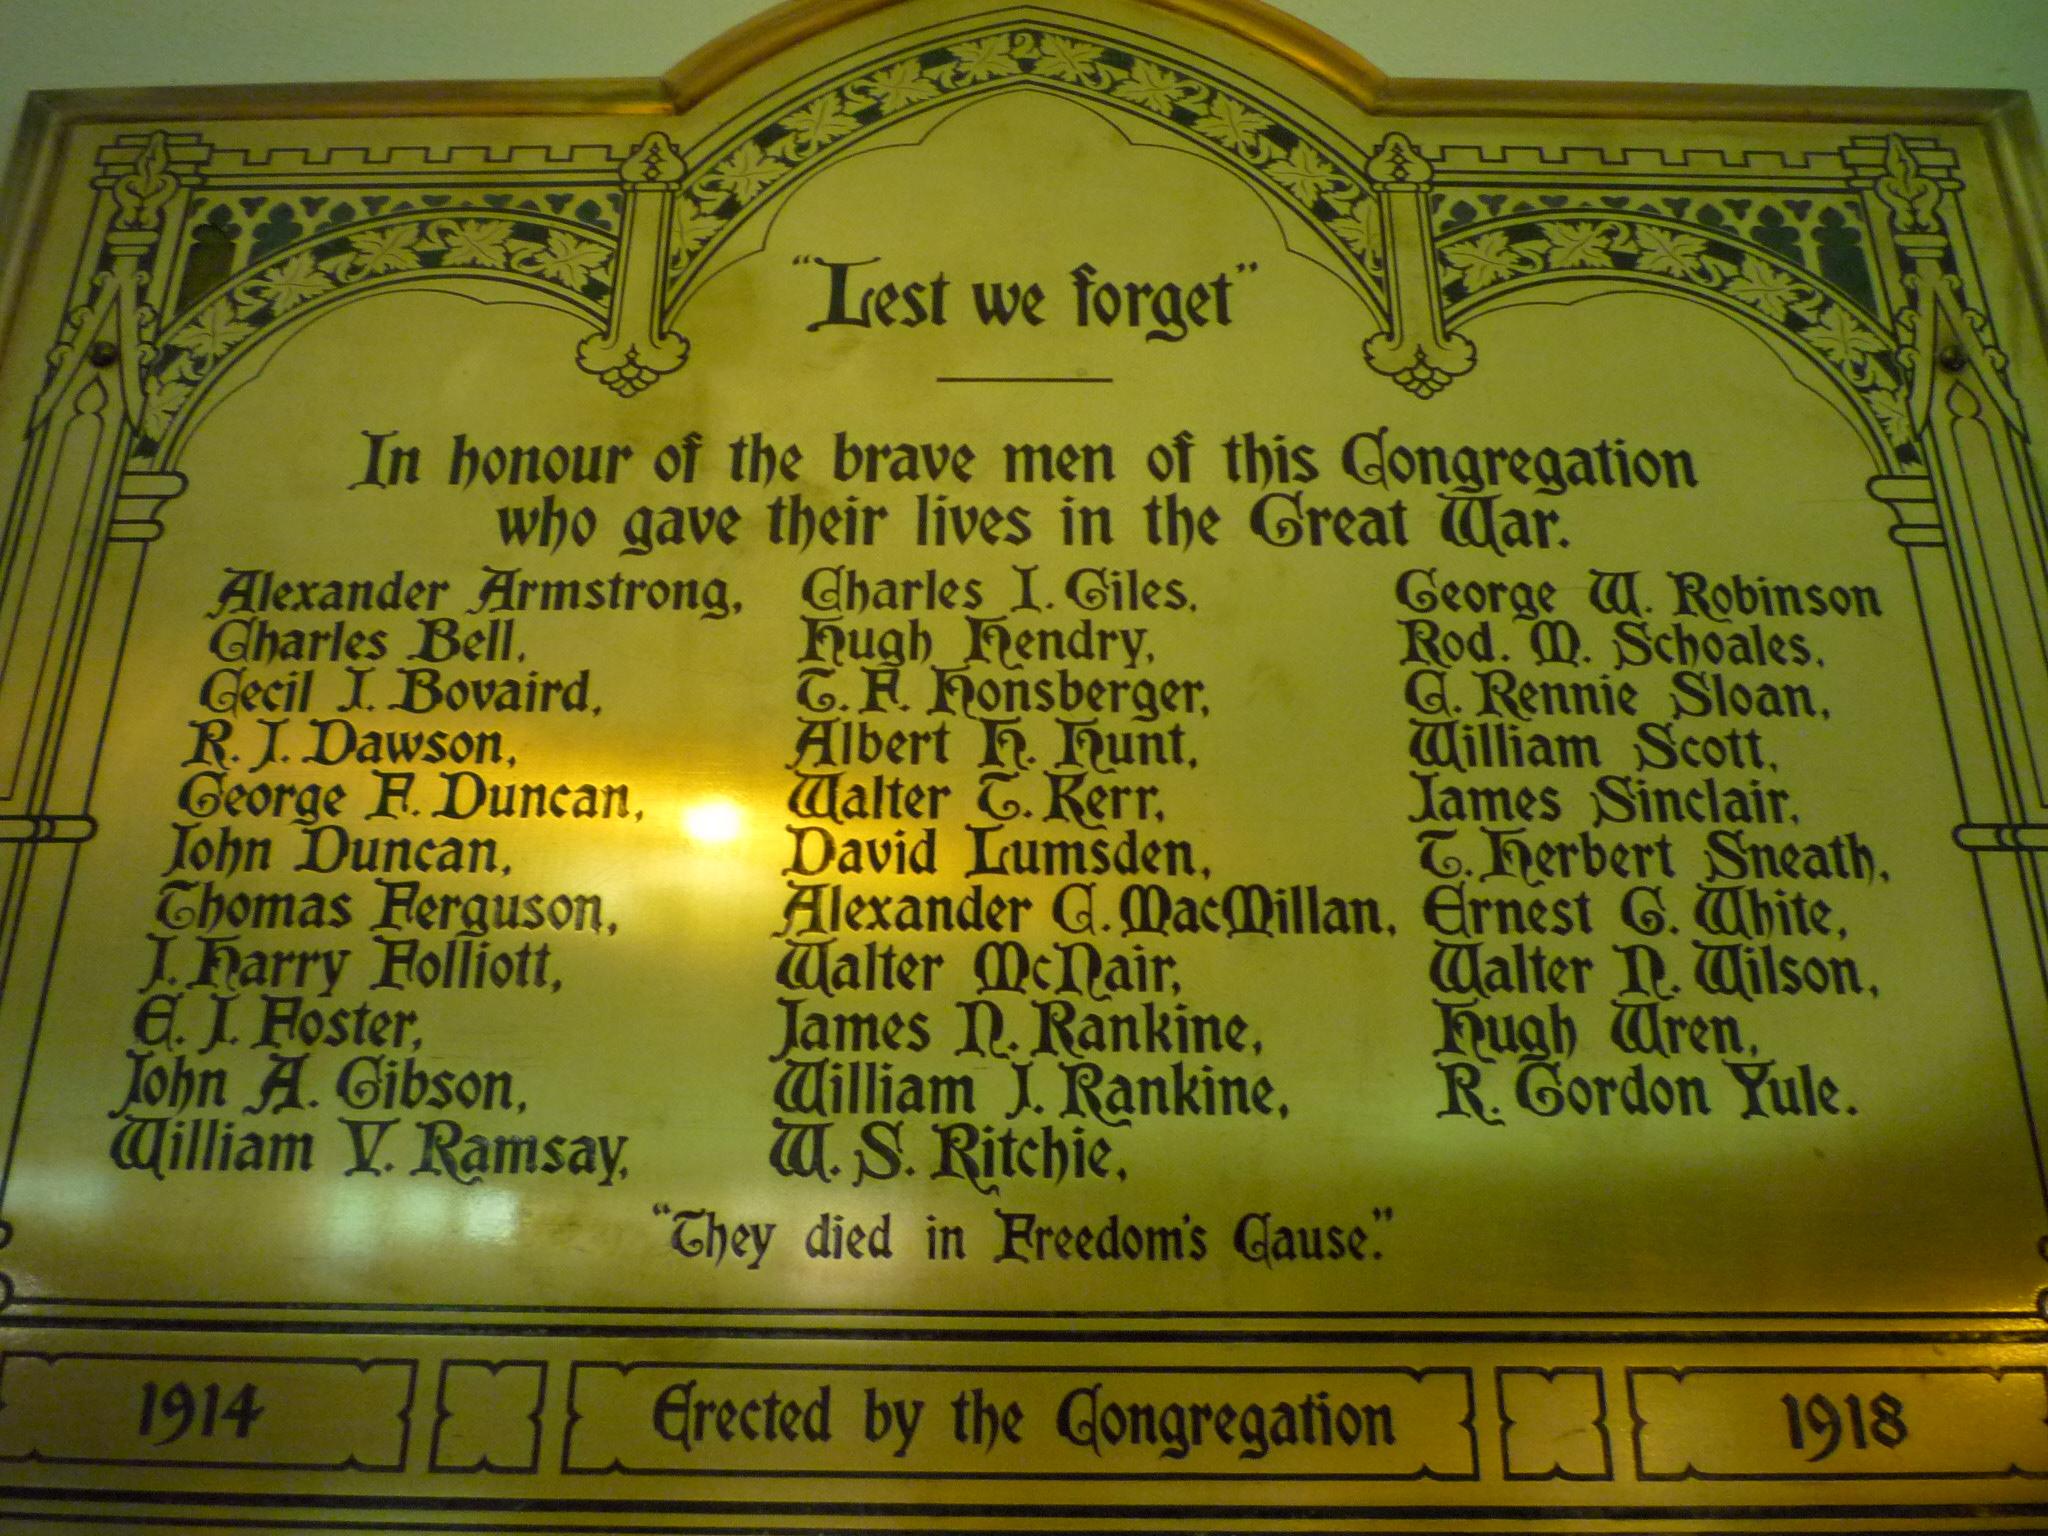 Memorial Plaque– Commemorative Plaque erected in the sanctuary of St. John's Presbyterian Church, Broadview Avenue, Toronto, Ontario, Canada.